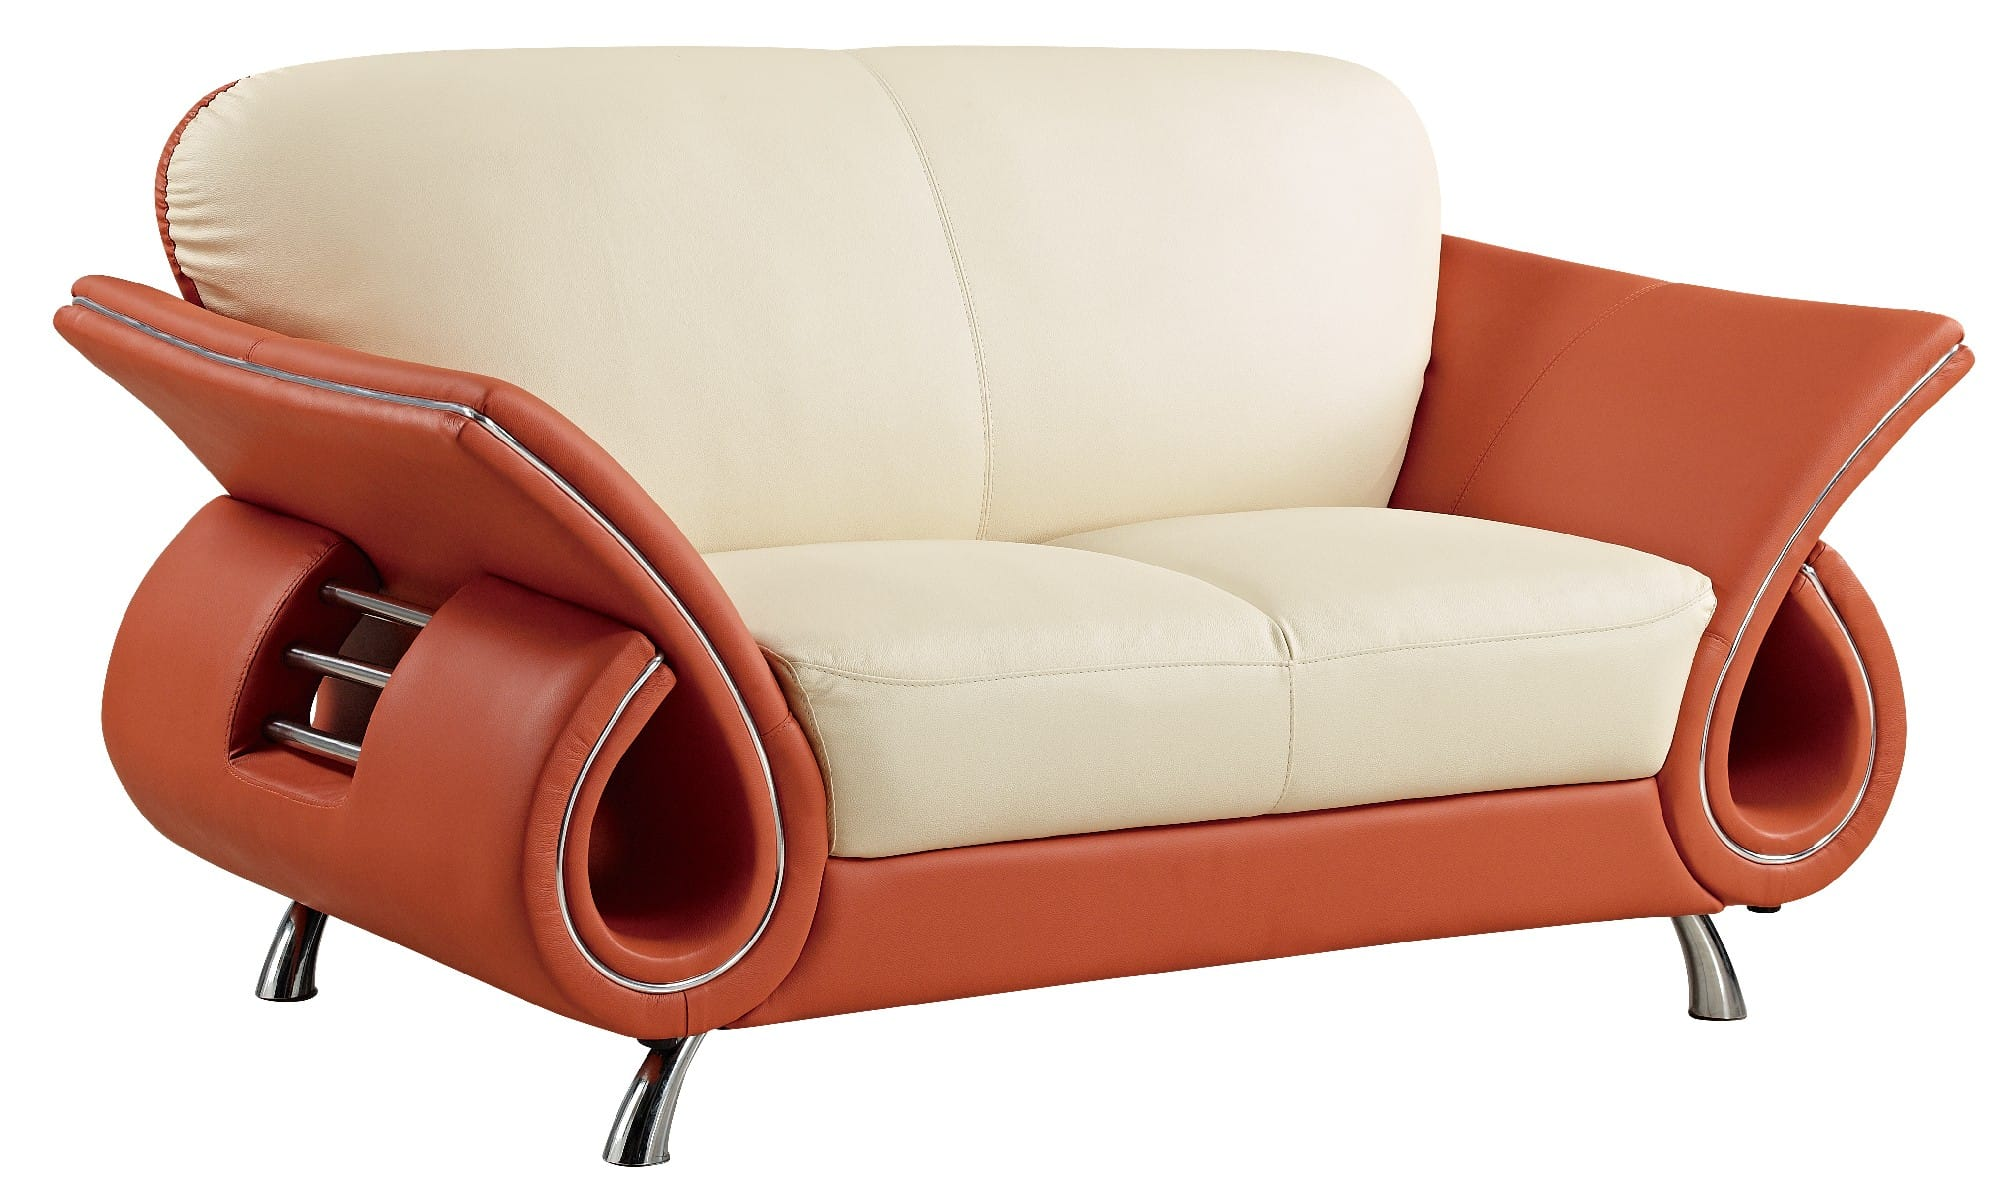 U559 Beige Orange Leather Loveseat By Global Furniture